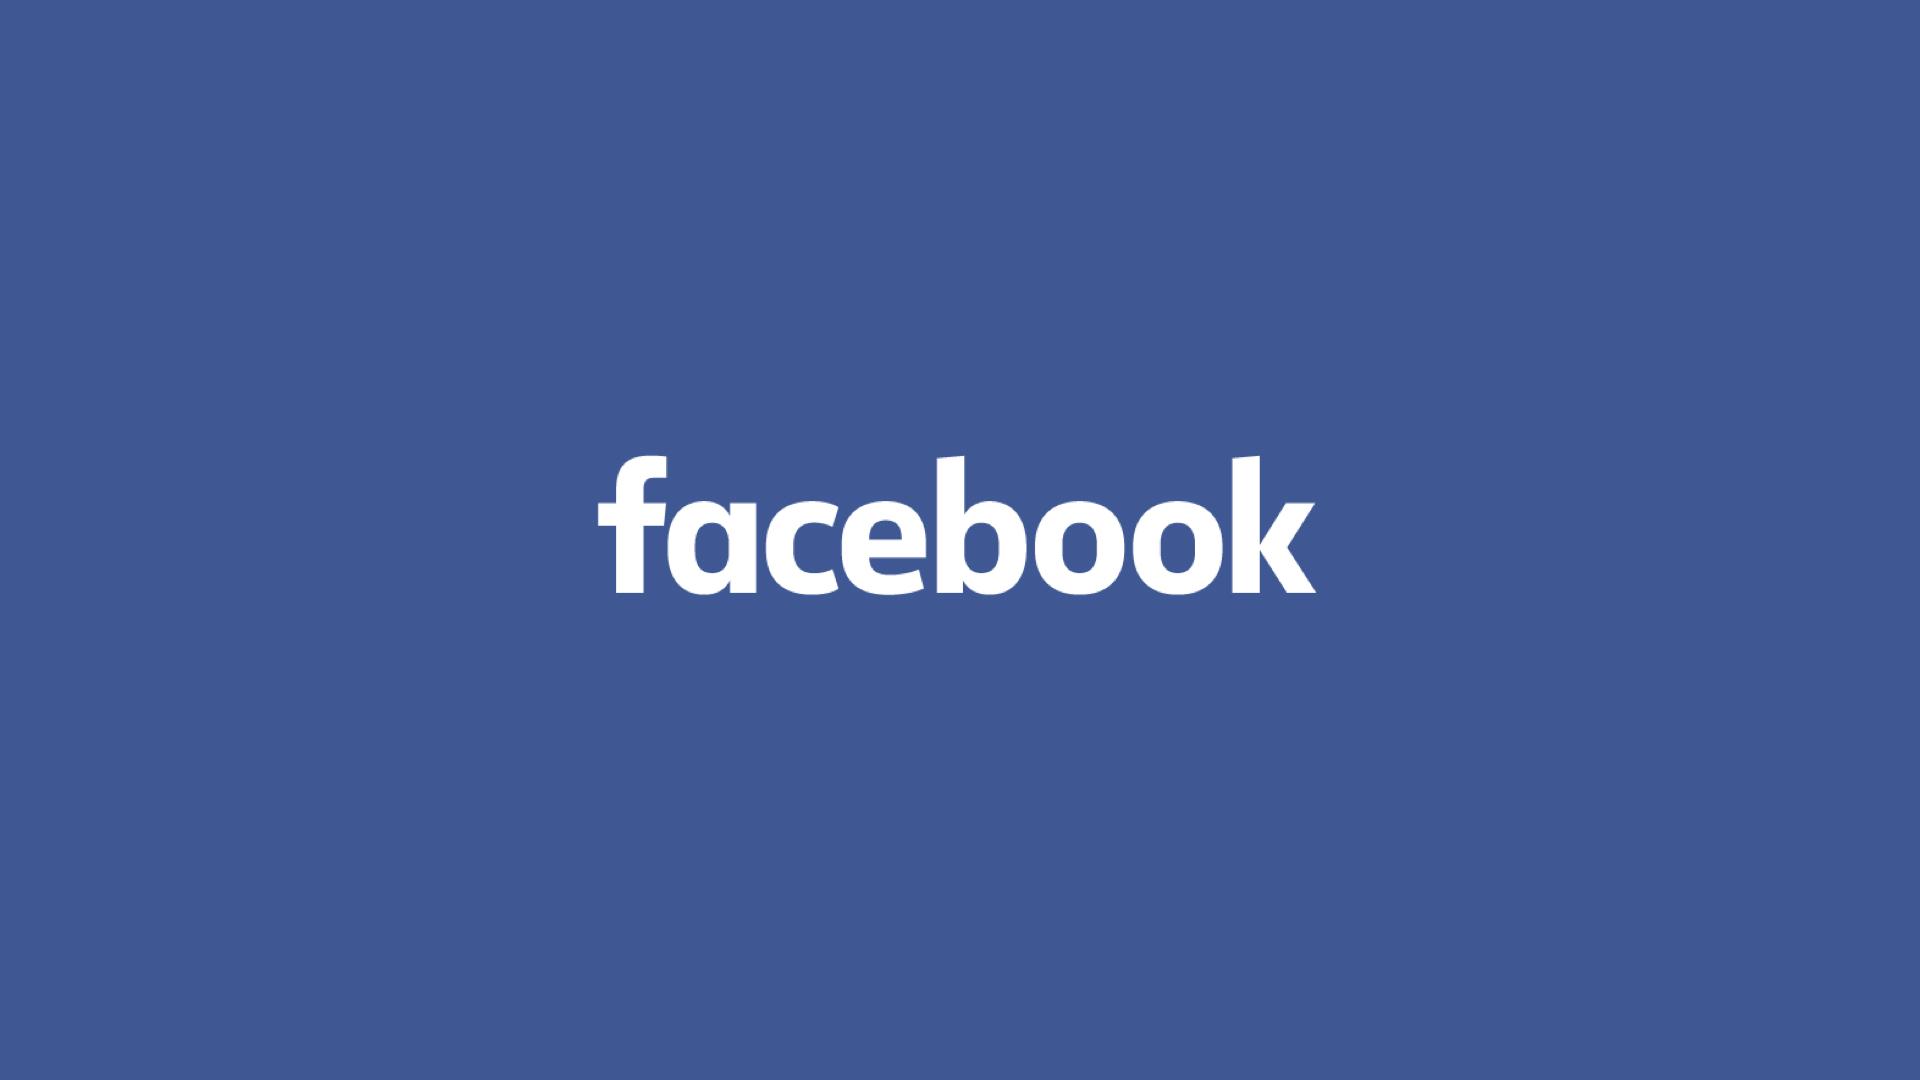 Facebook needs positive regulatory framework